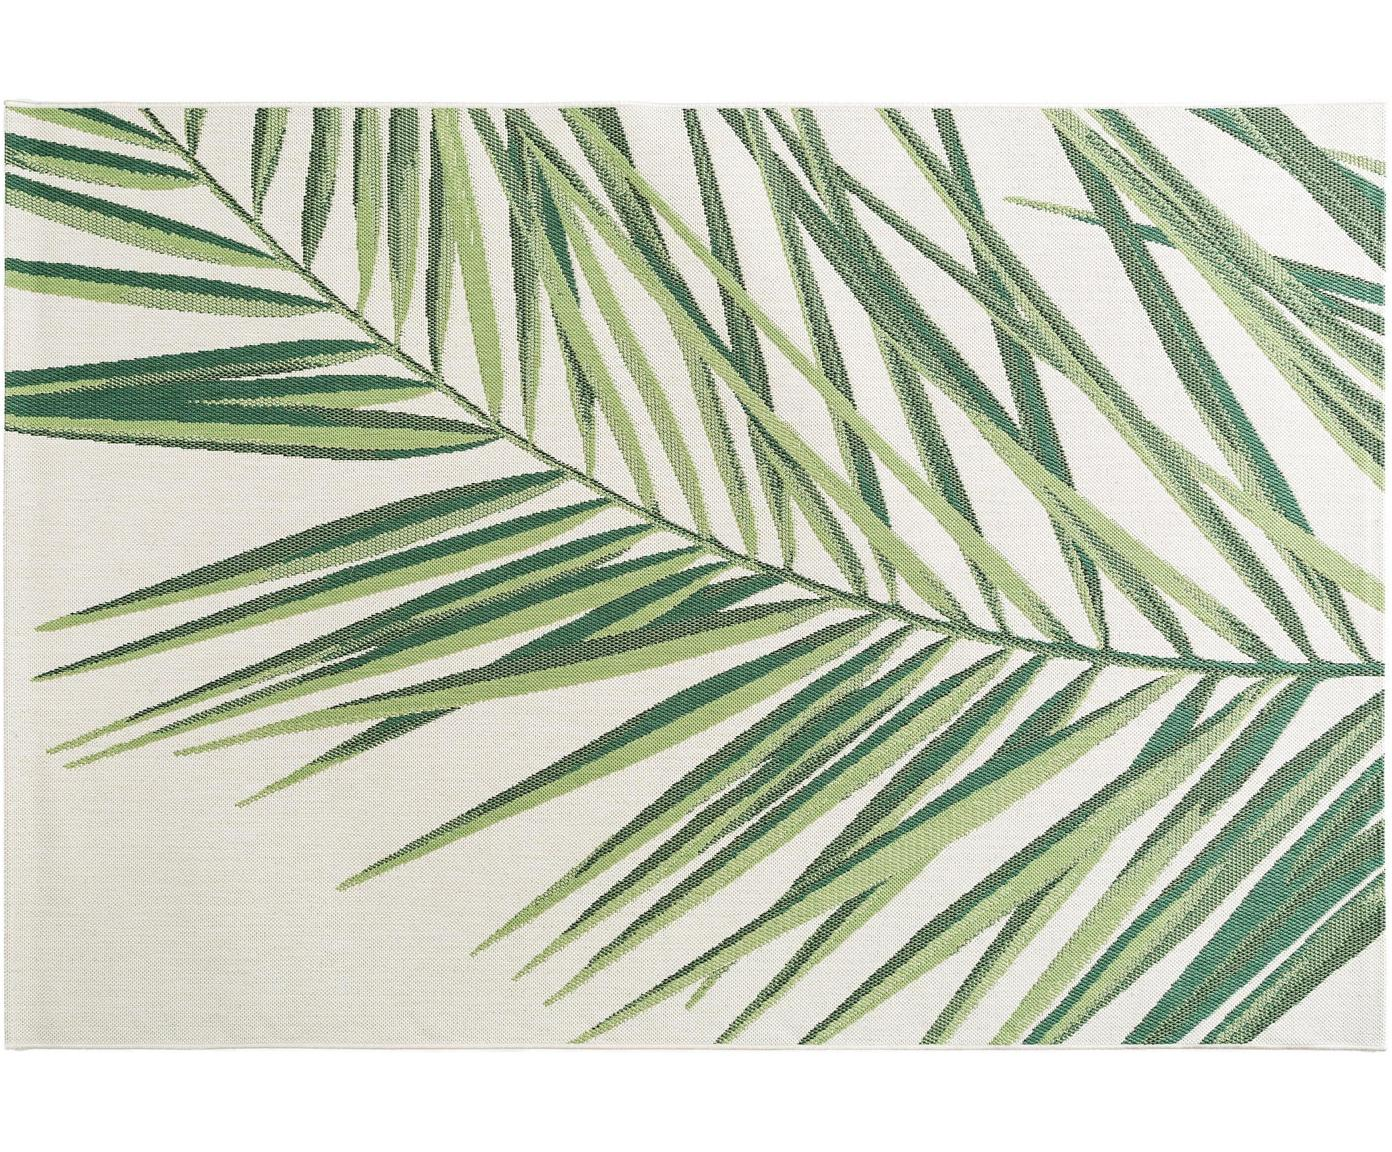 Alfombra de interior/exterior Capri Palm, Polipropileno, Verde, beige, An 80 x L 150 cm (Tamaño XS)